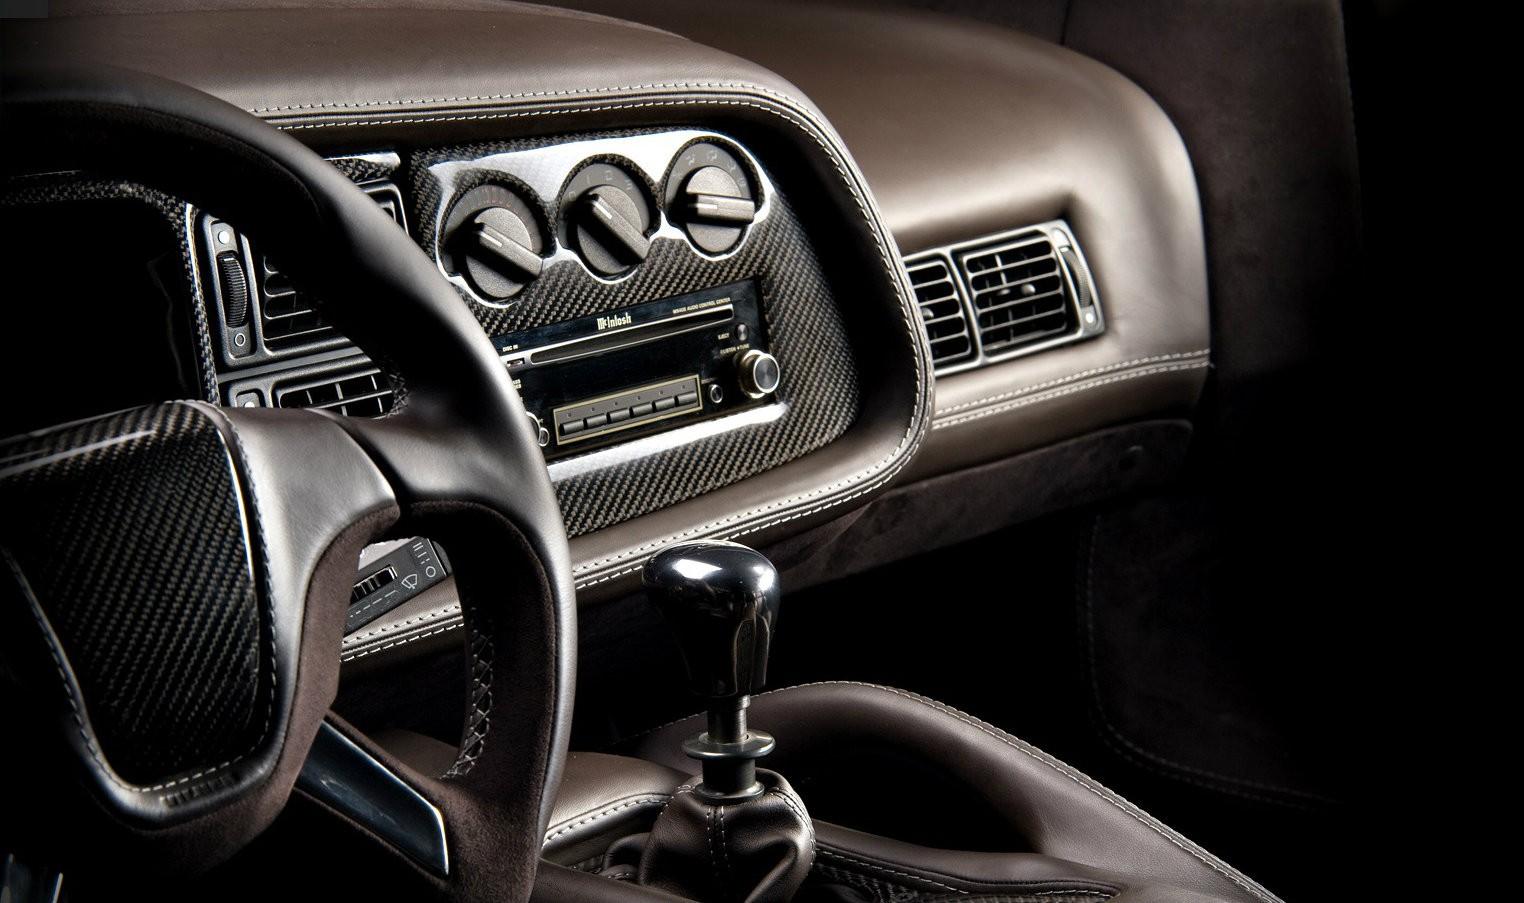 Jaguar Xj220 Interior Makeover By Vilner Breathes New Life Into The Elderly Hypercar Autoevolution